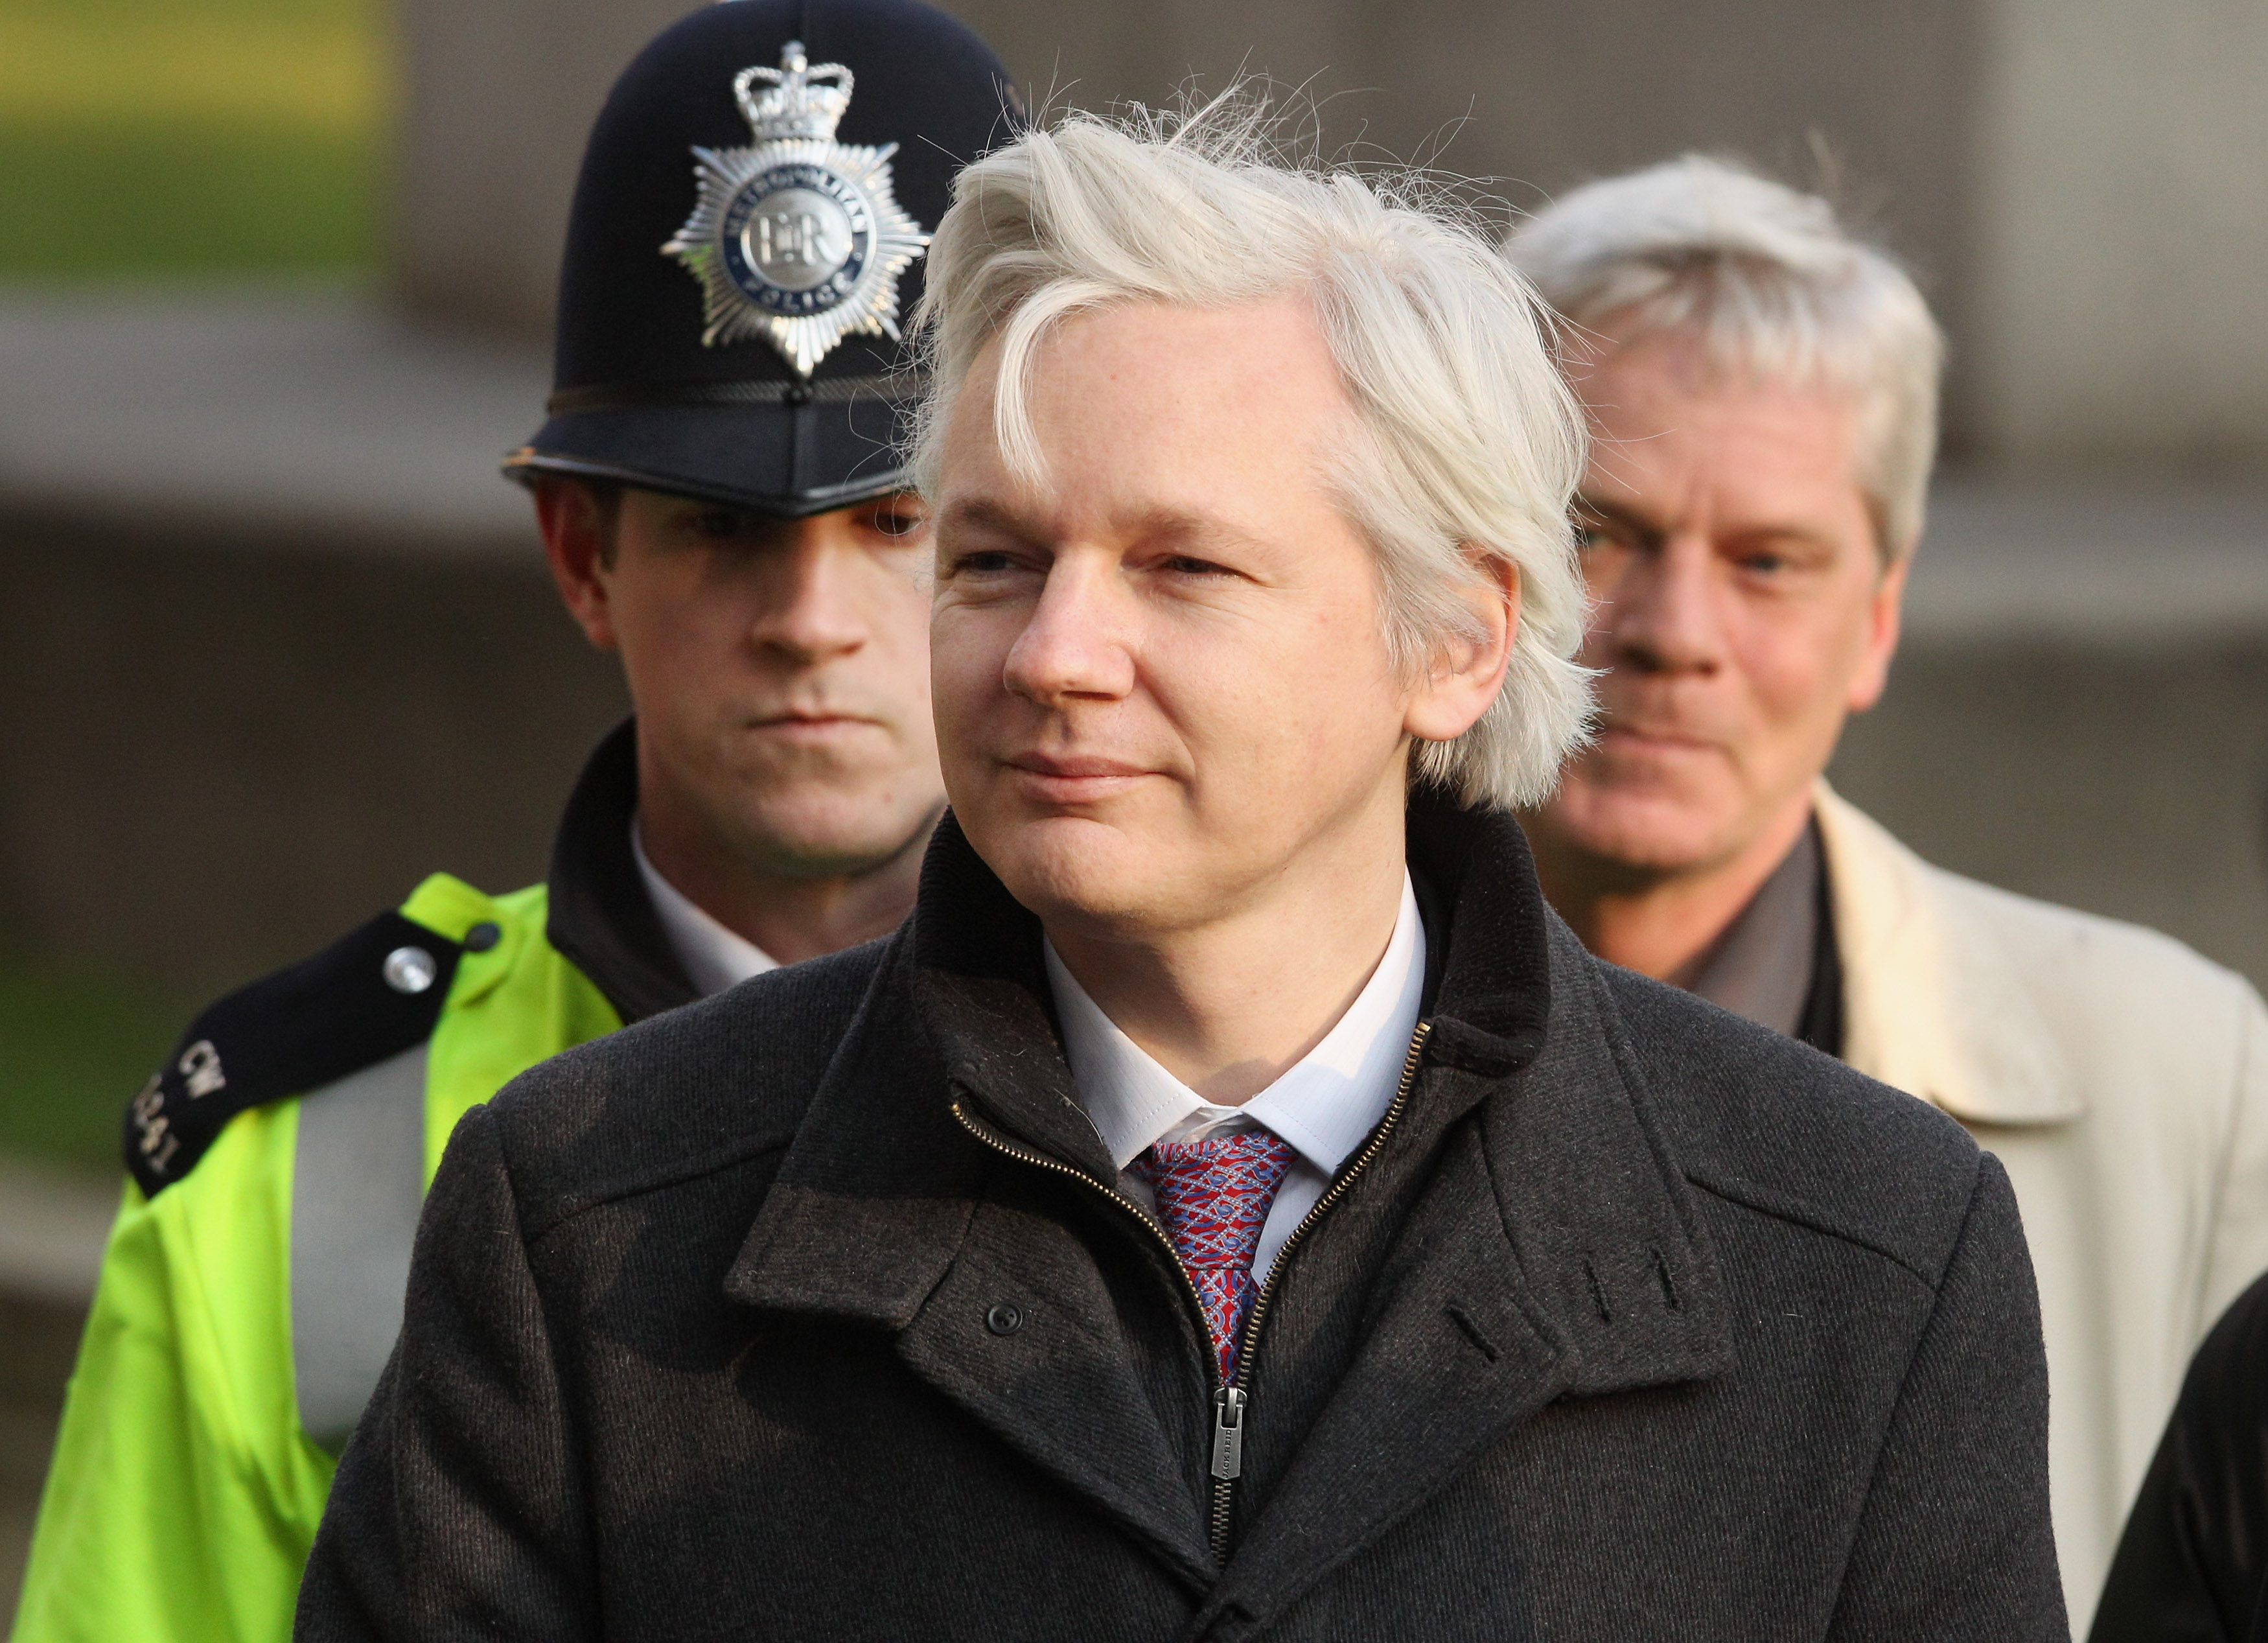 WikiLeaks founder Julian Assange will only turn himself in if Chelsea Manning gets clemency.